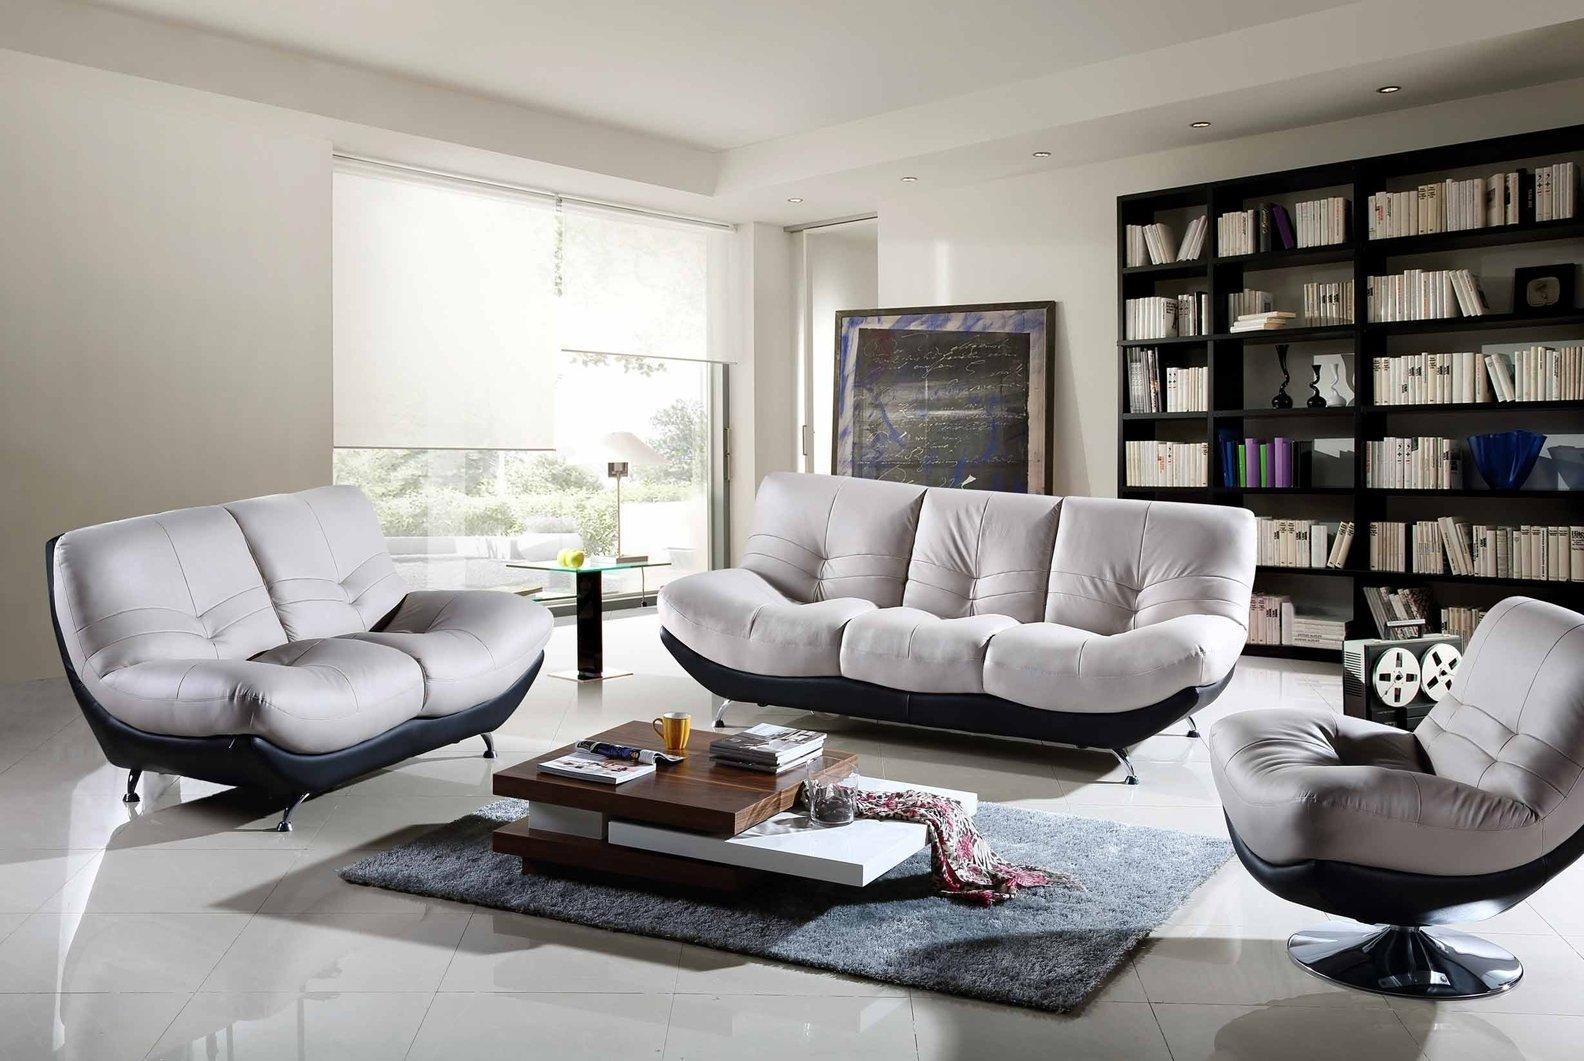 10 Cute Contemporary Living Room Furniture Ideas contemporary living room furniture design ideas zachary horne